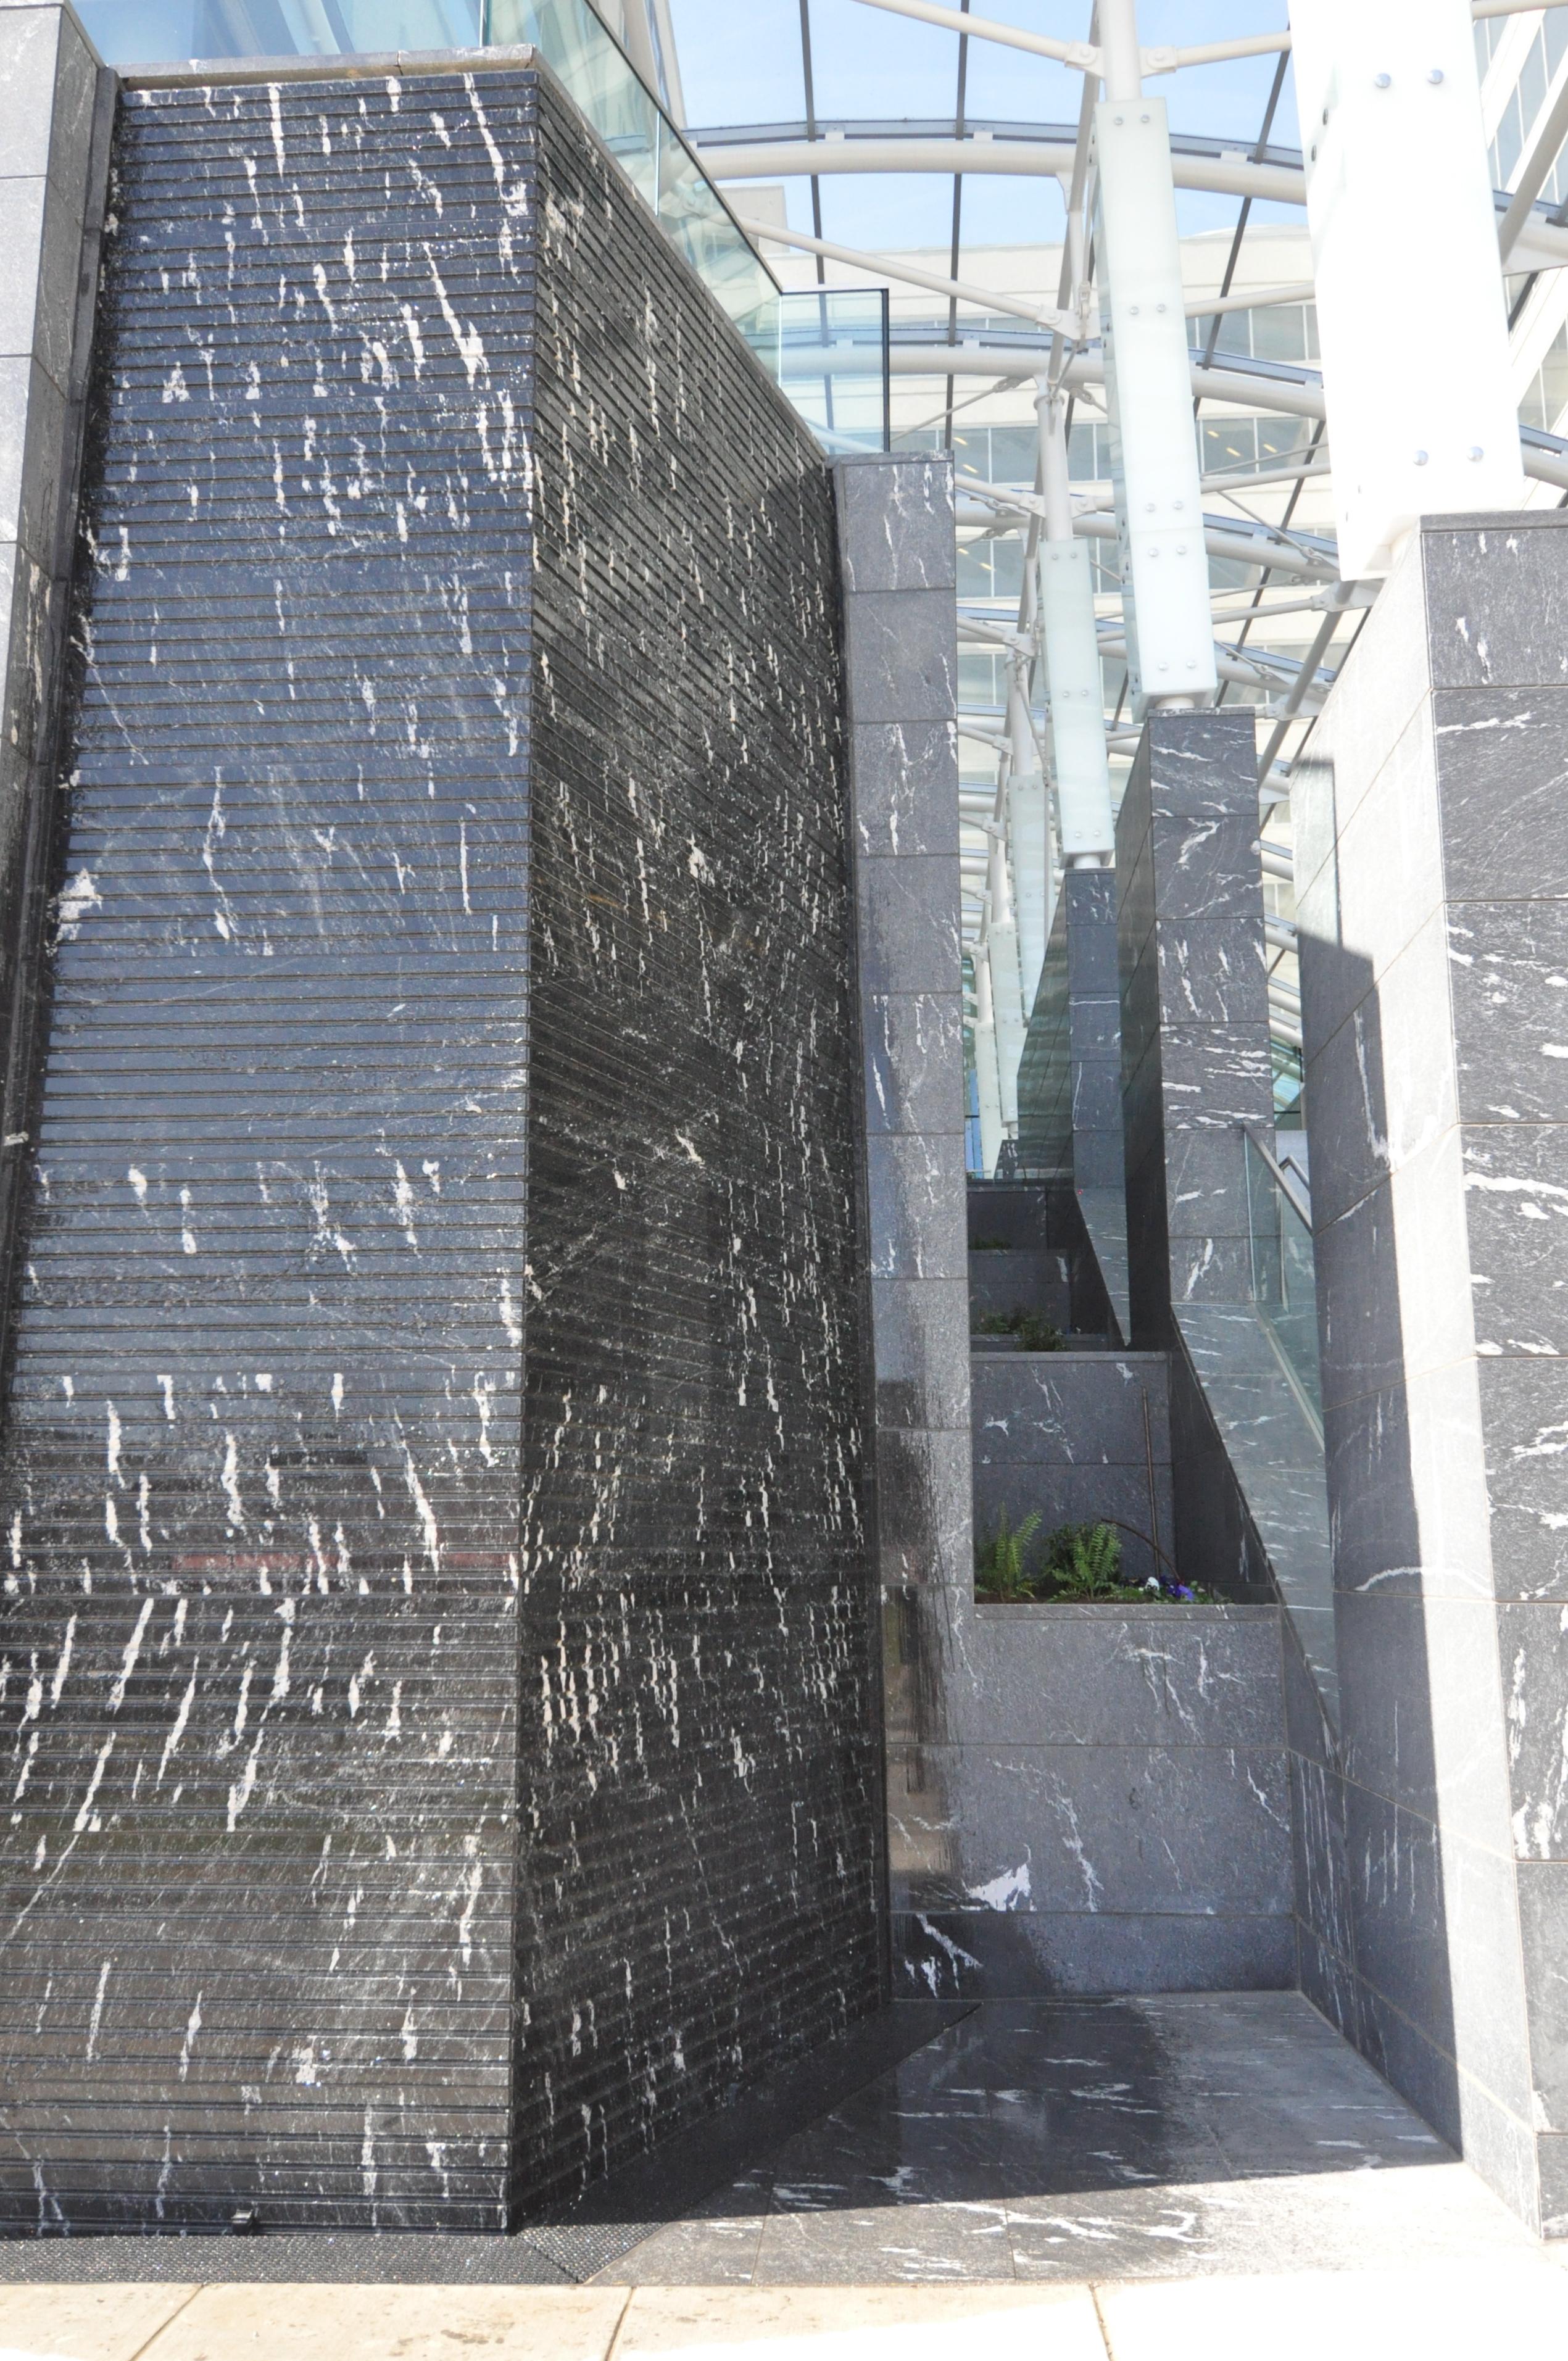 23ft Tall Cut Granite Water Wall, Greensboro Station, McLean, VA.